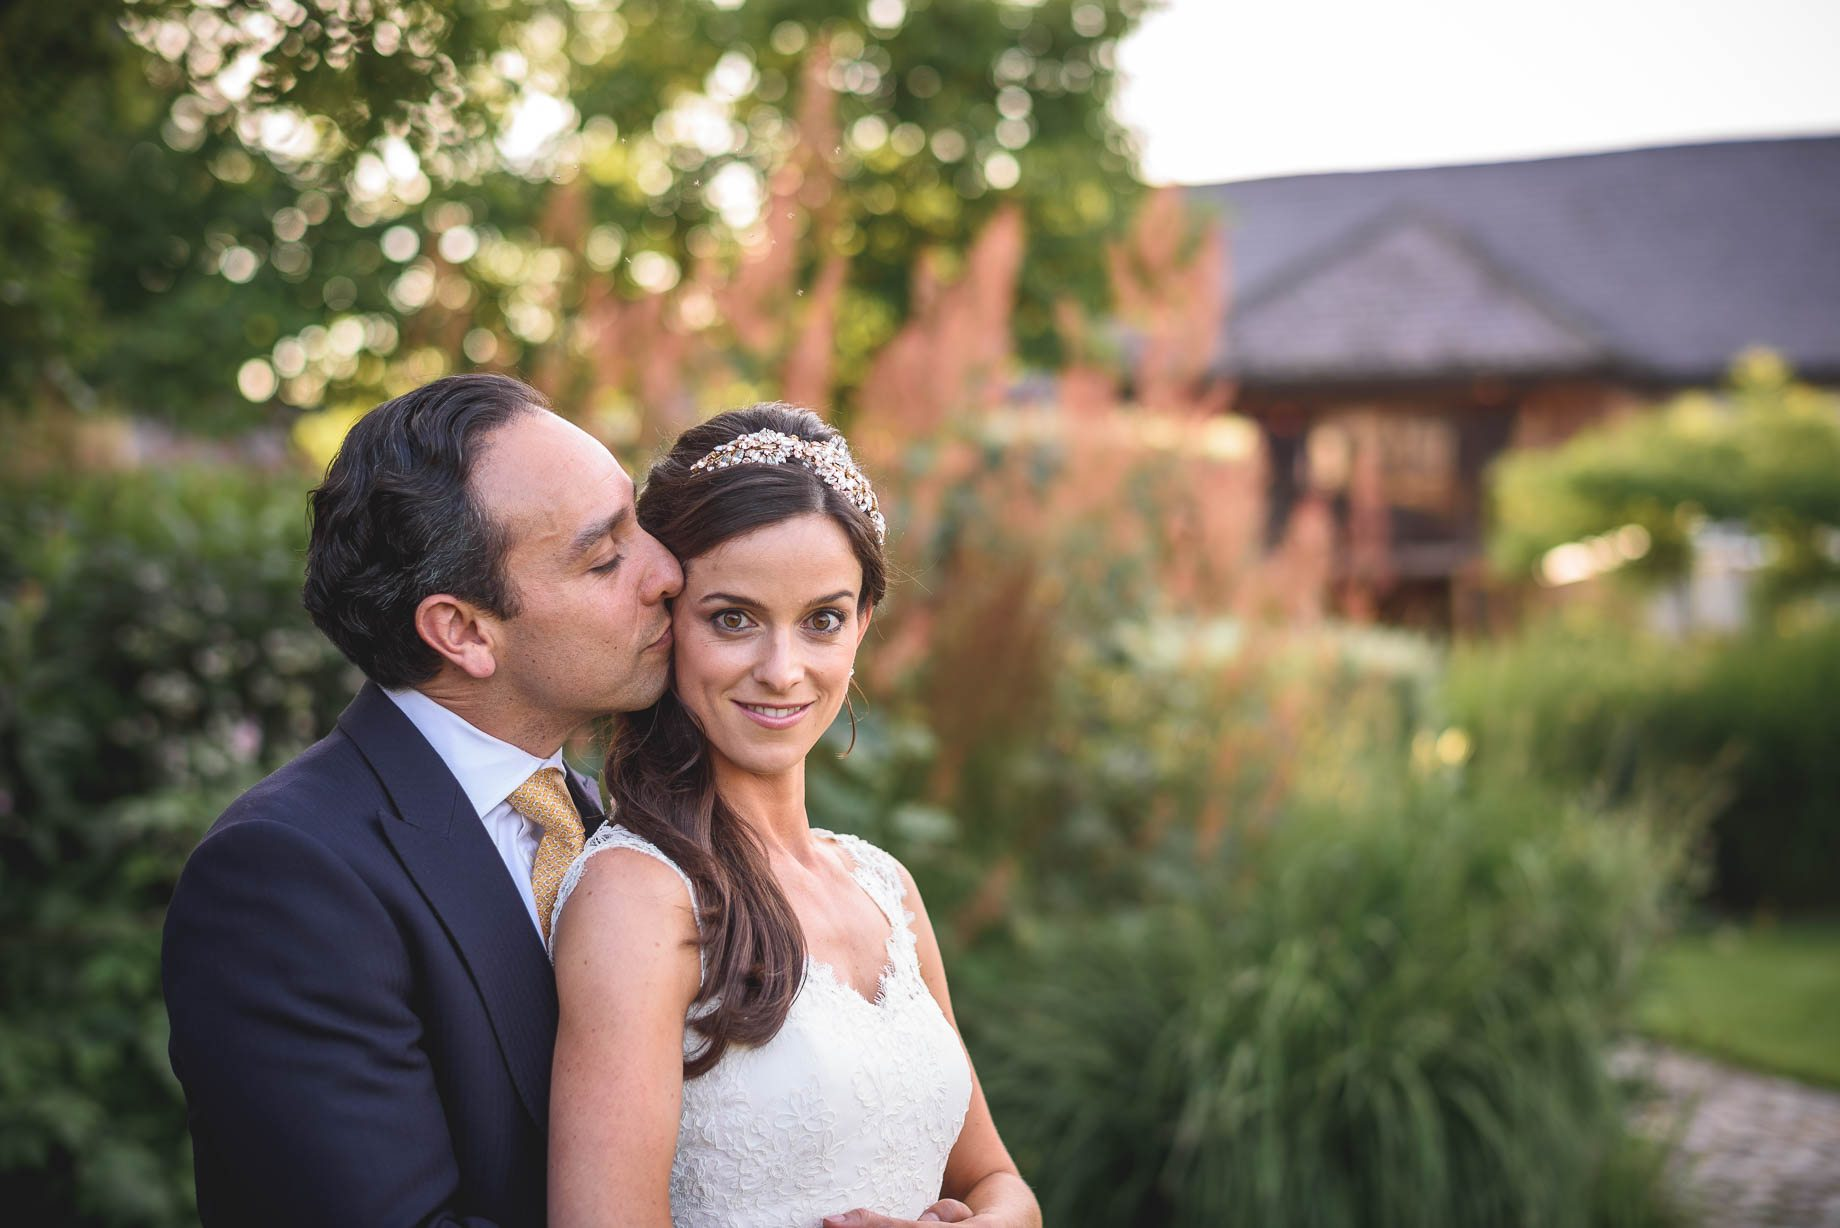 Bury Court Barn Wedding Photography - Caroline and Rob (167 of 219)